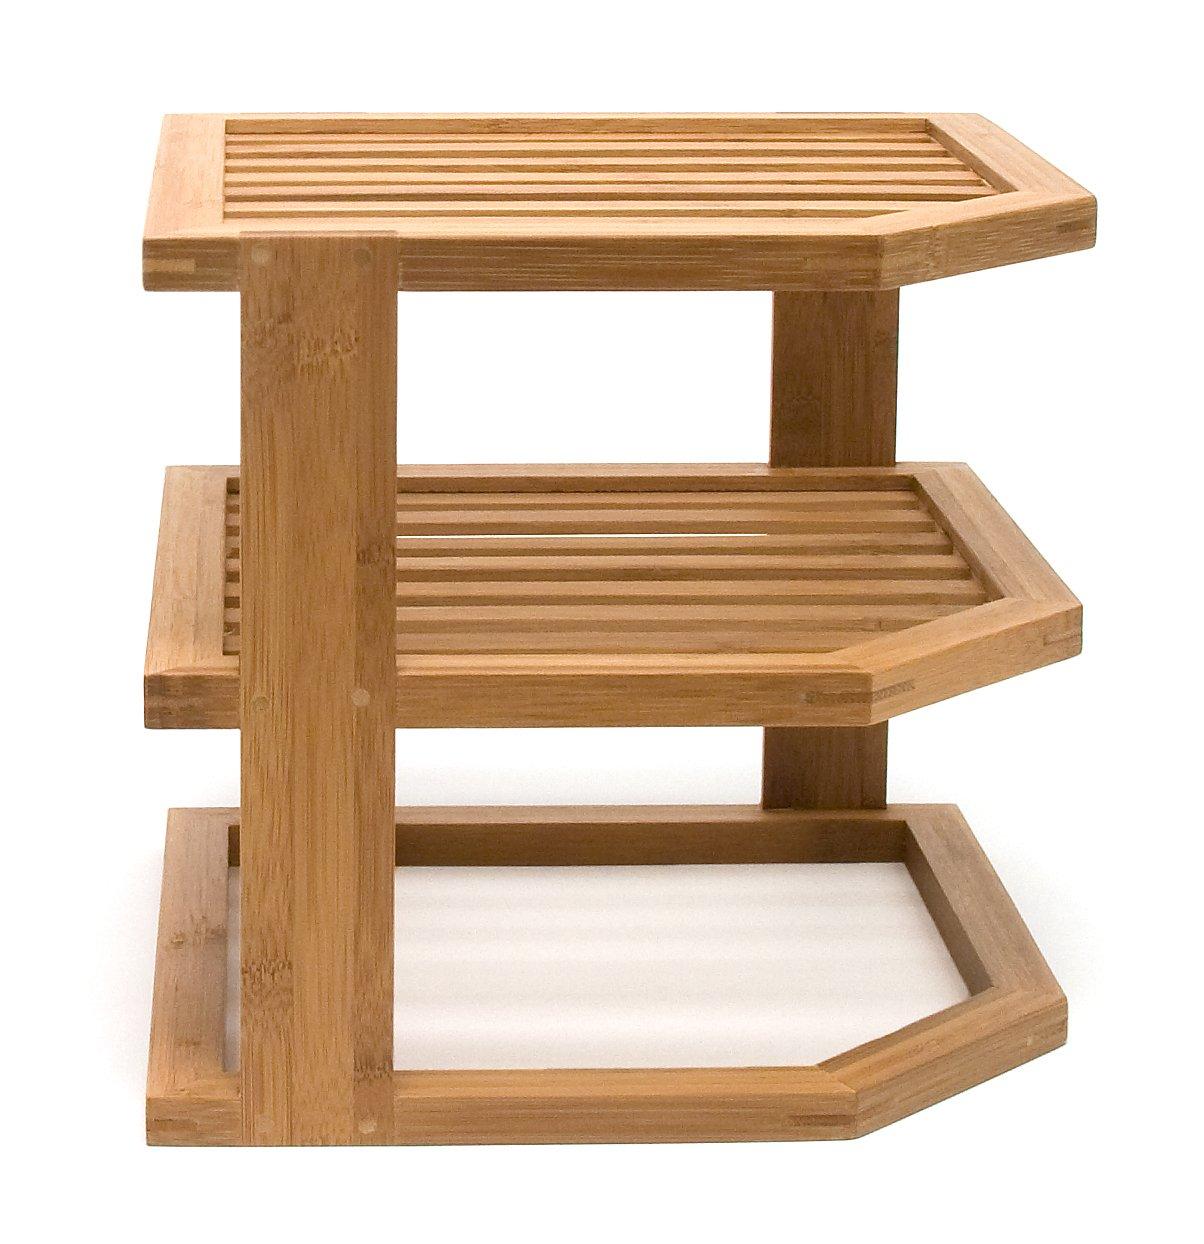 Lipper International 8883 Bamboo Wood 3-Tier Corner Kitchen Storage Shelf, 10'' x 10'' x 9-1/2''